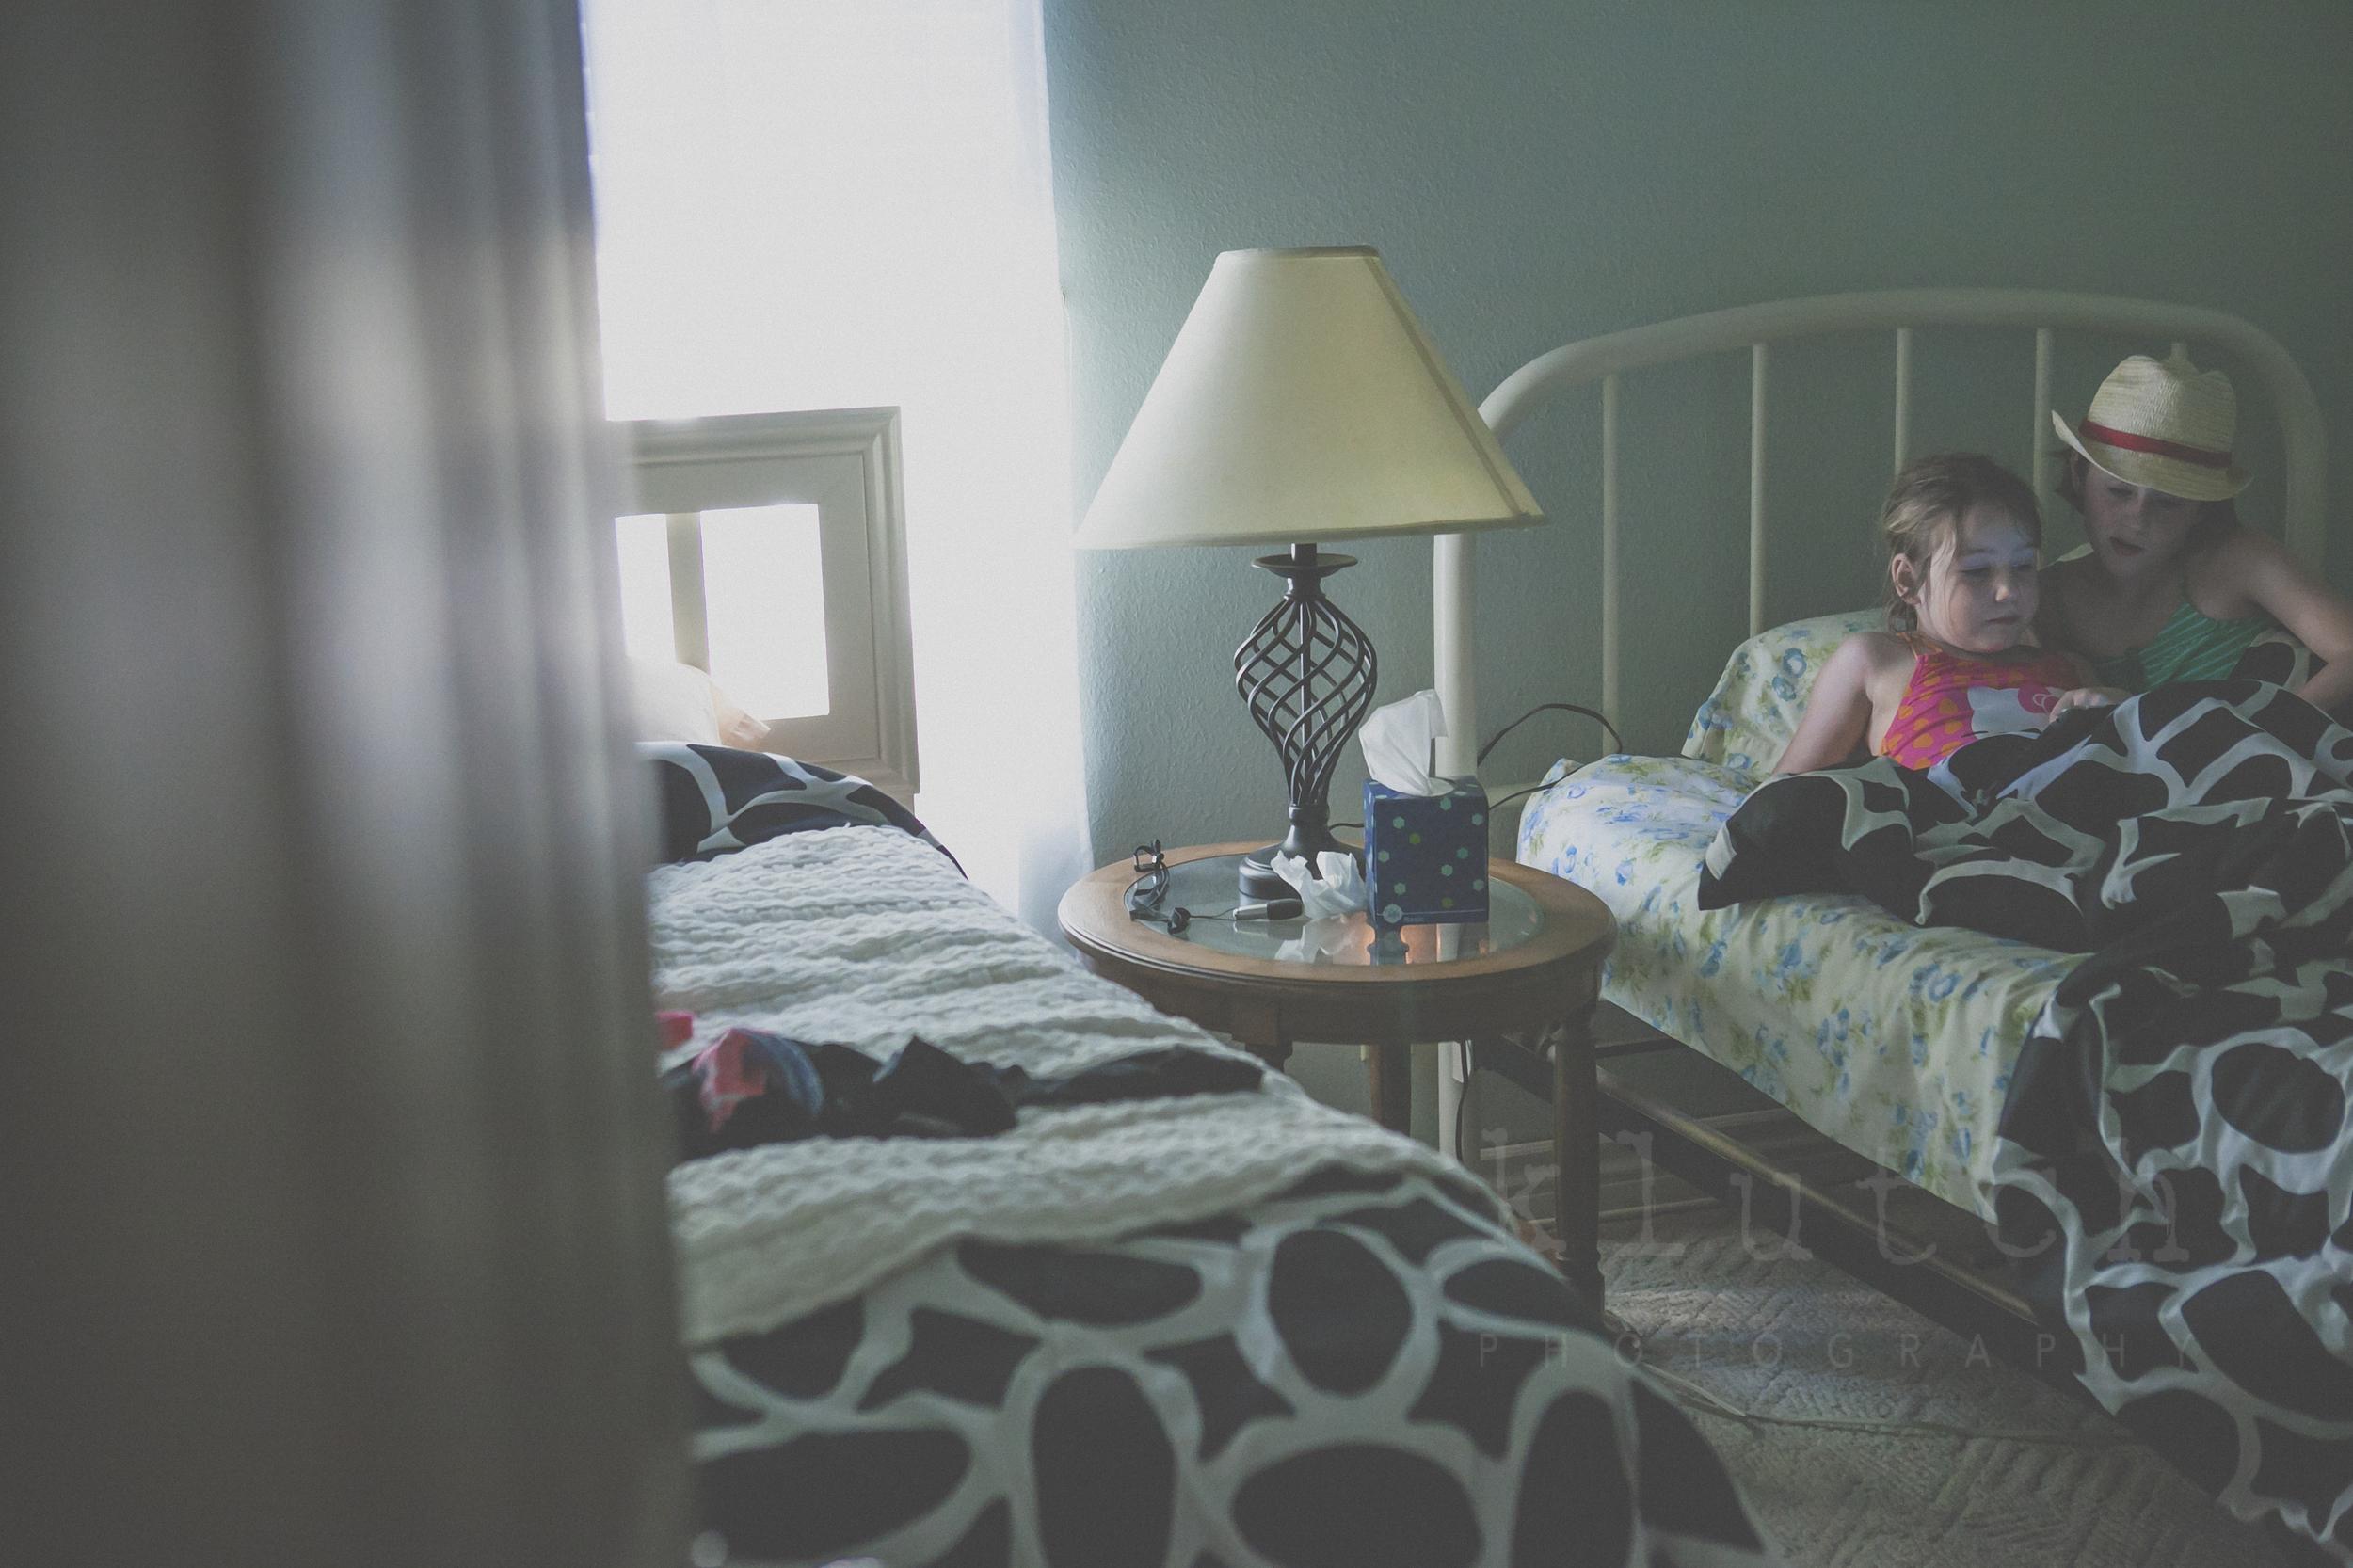 Klutch Photography,white rock family photographer, vancouver family photographer, whiterock lifestyle photographer, life unscripted photographer, life unscripted session, photography,Dina Ferreira Stoddard-1-31.jpg